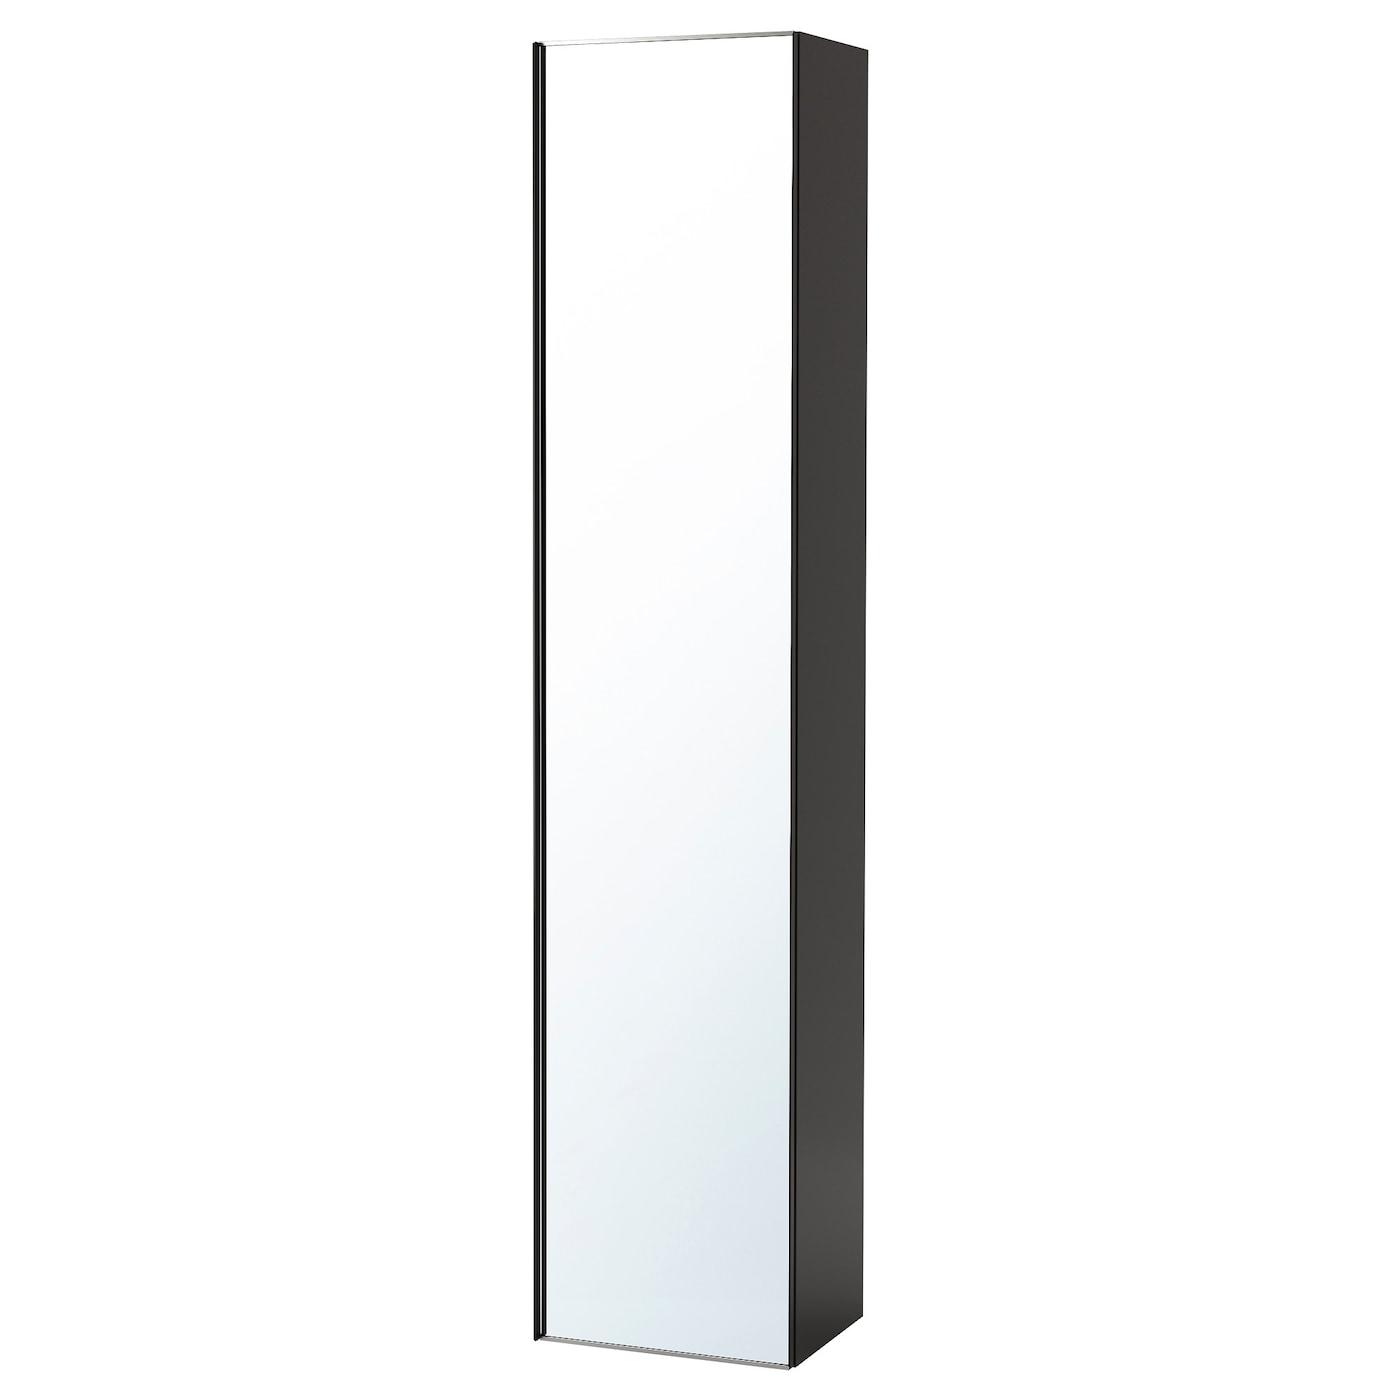 godmorgon armoire avec porte miroir brillant gris 40x32x192 cm ikea. Black Bedroom Furniture Sets. Home Design Ideas